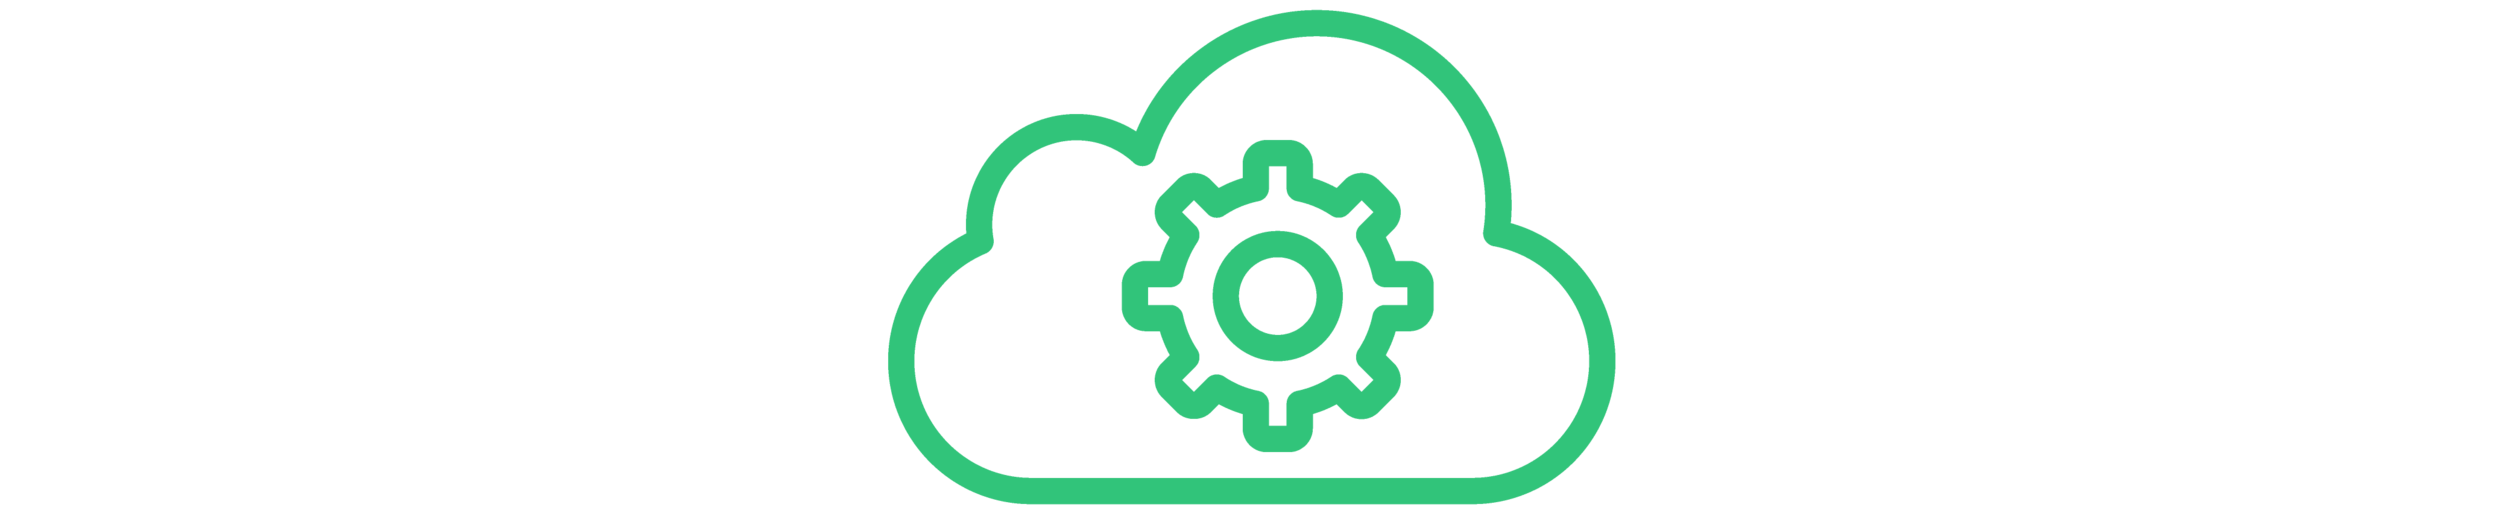 Cloud_management_icon.png